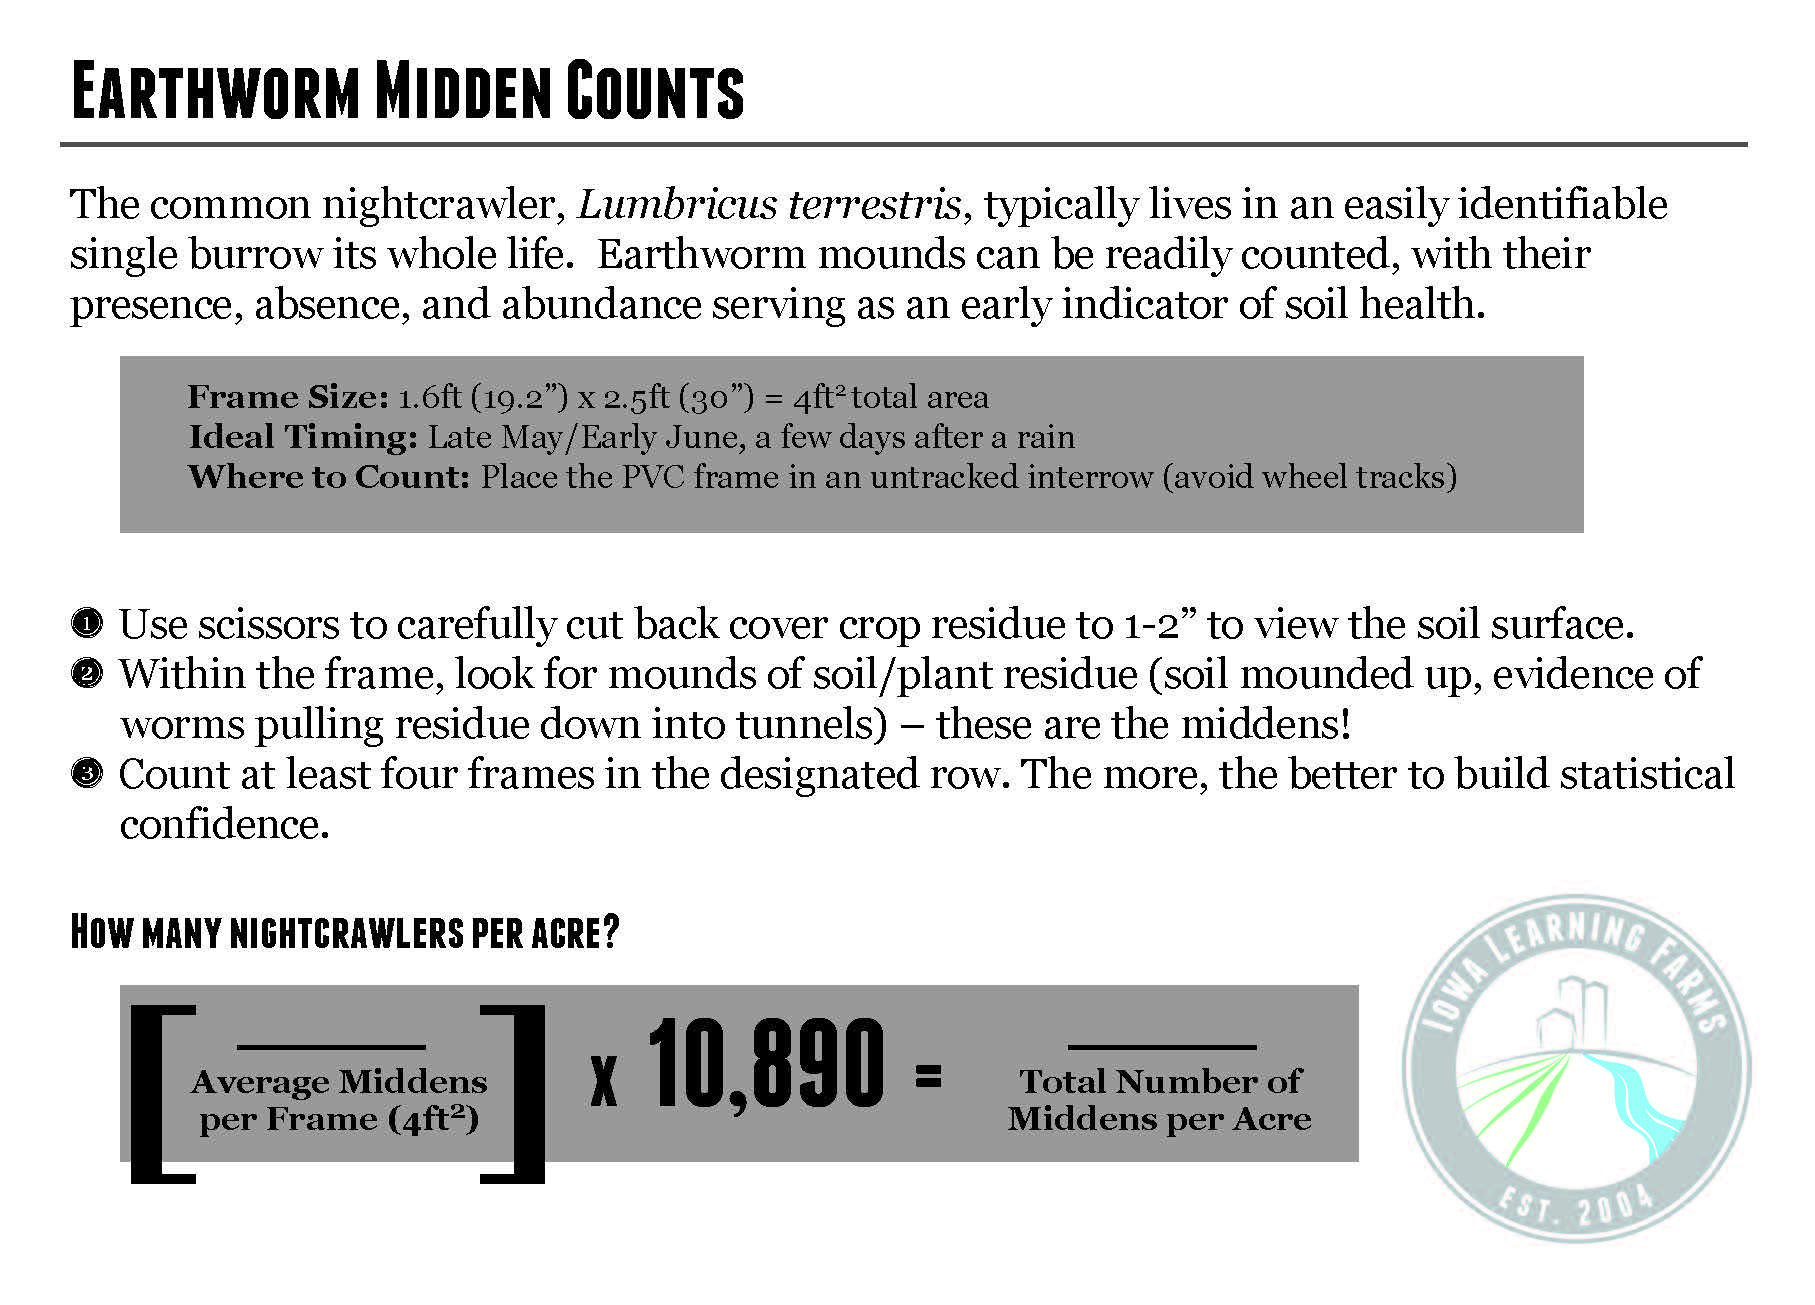 EarthwormMiddenPostcard_Page_1.jpg